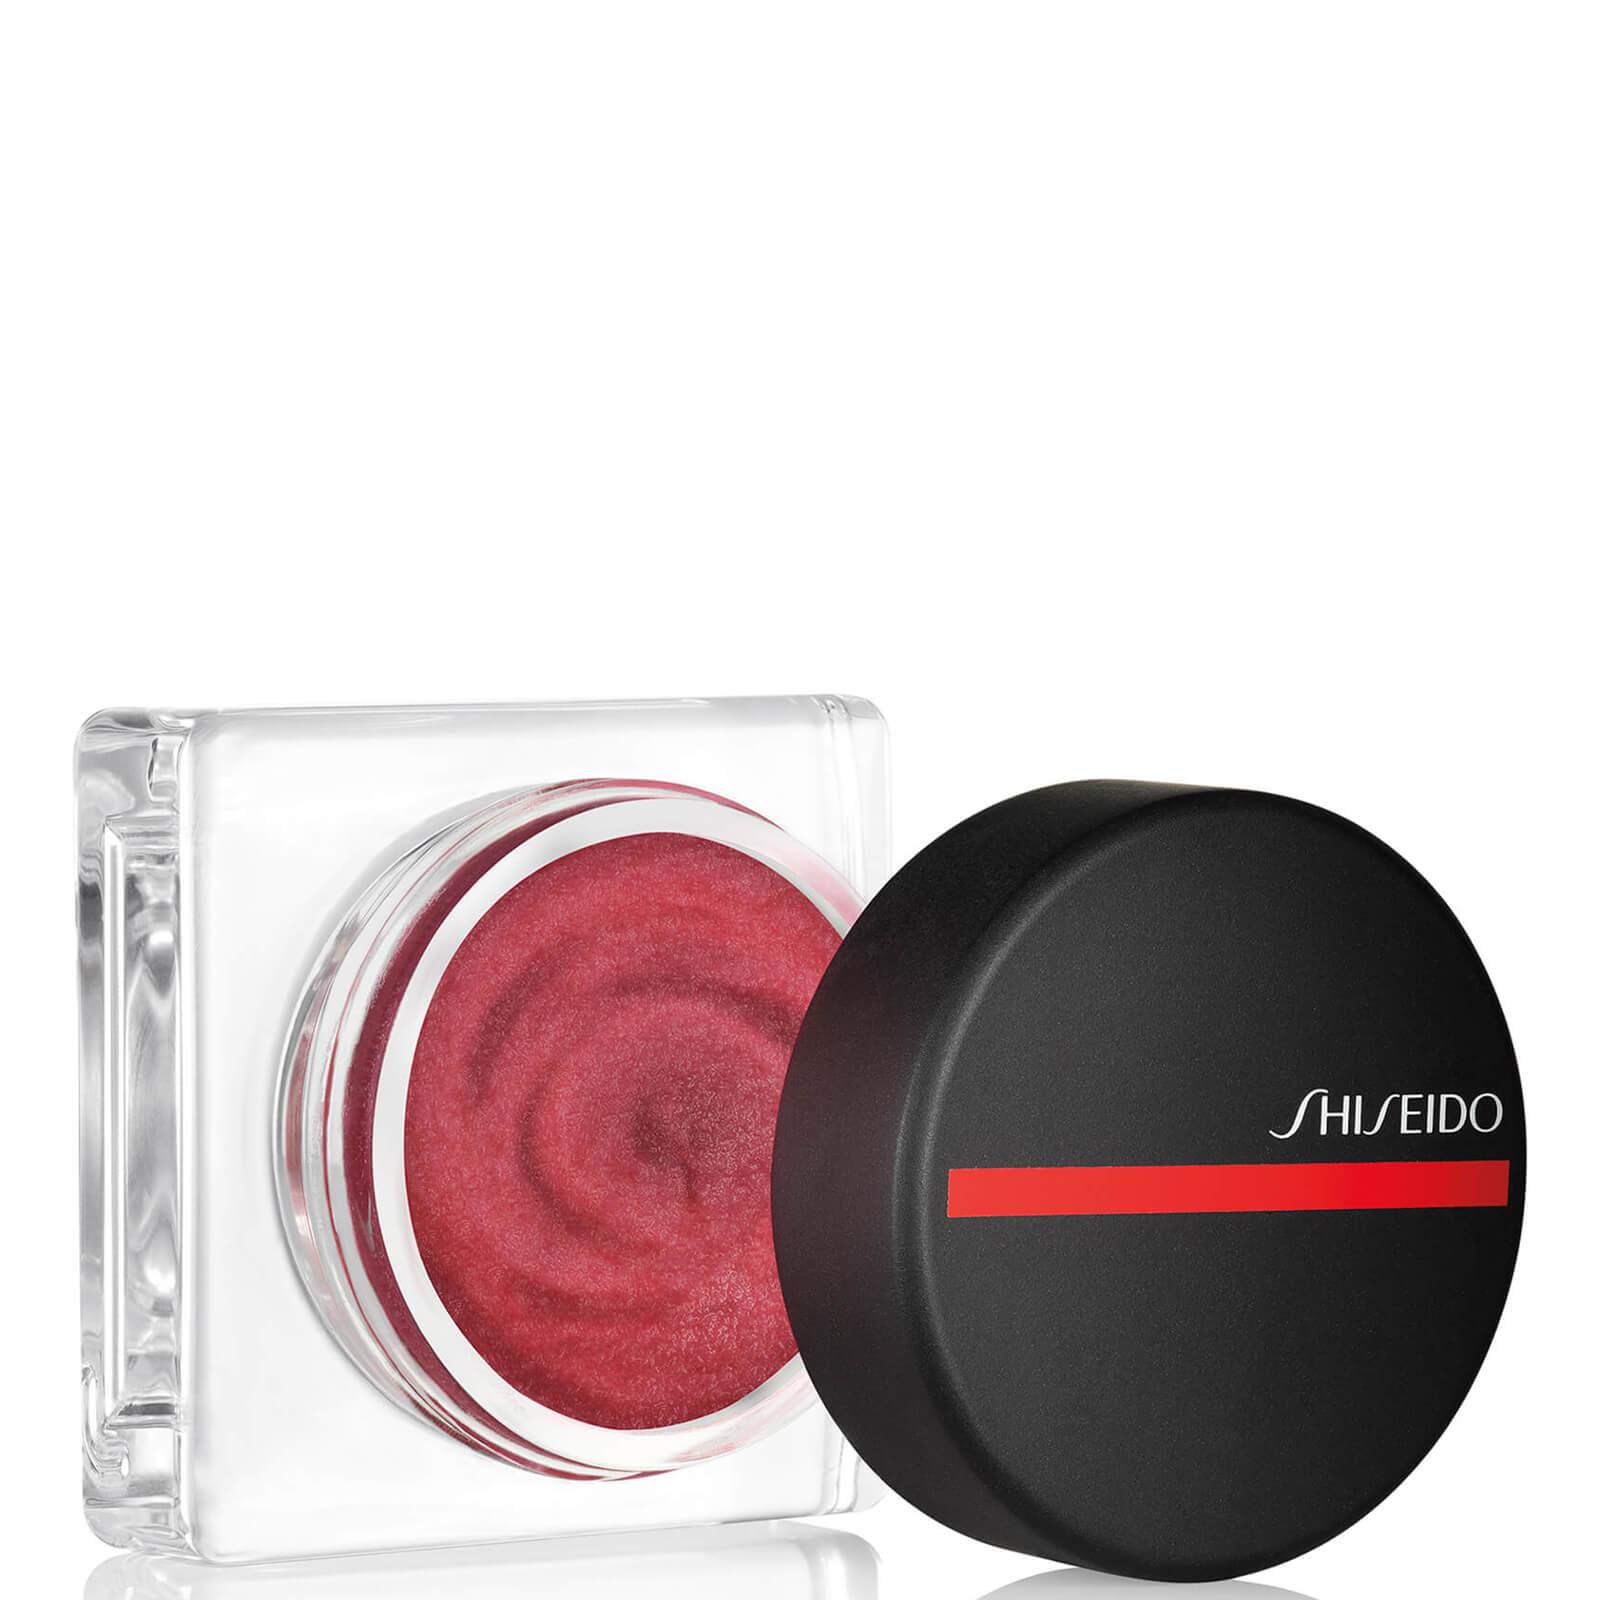 Купить Румяна-вуаль Shiseido Minimalist Whipped Powder Blush (различные оттенки) - Blush Sayoko 06